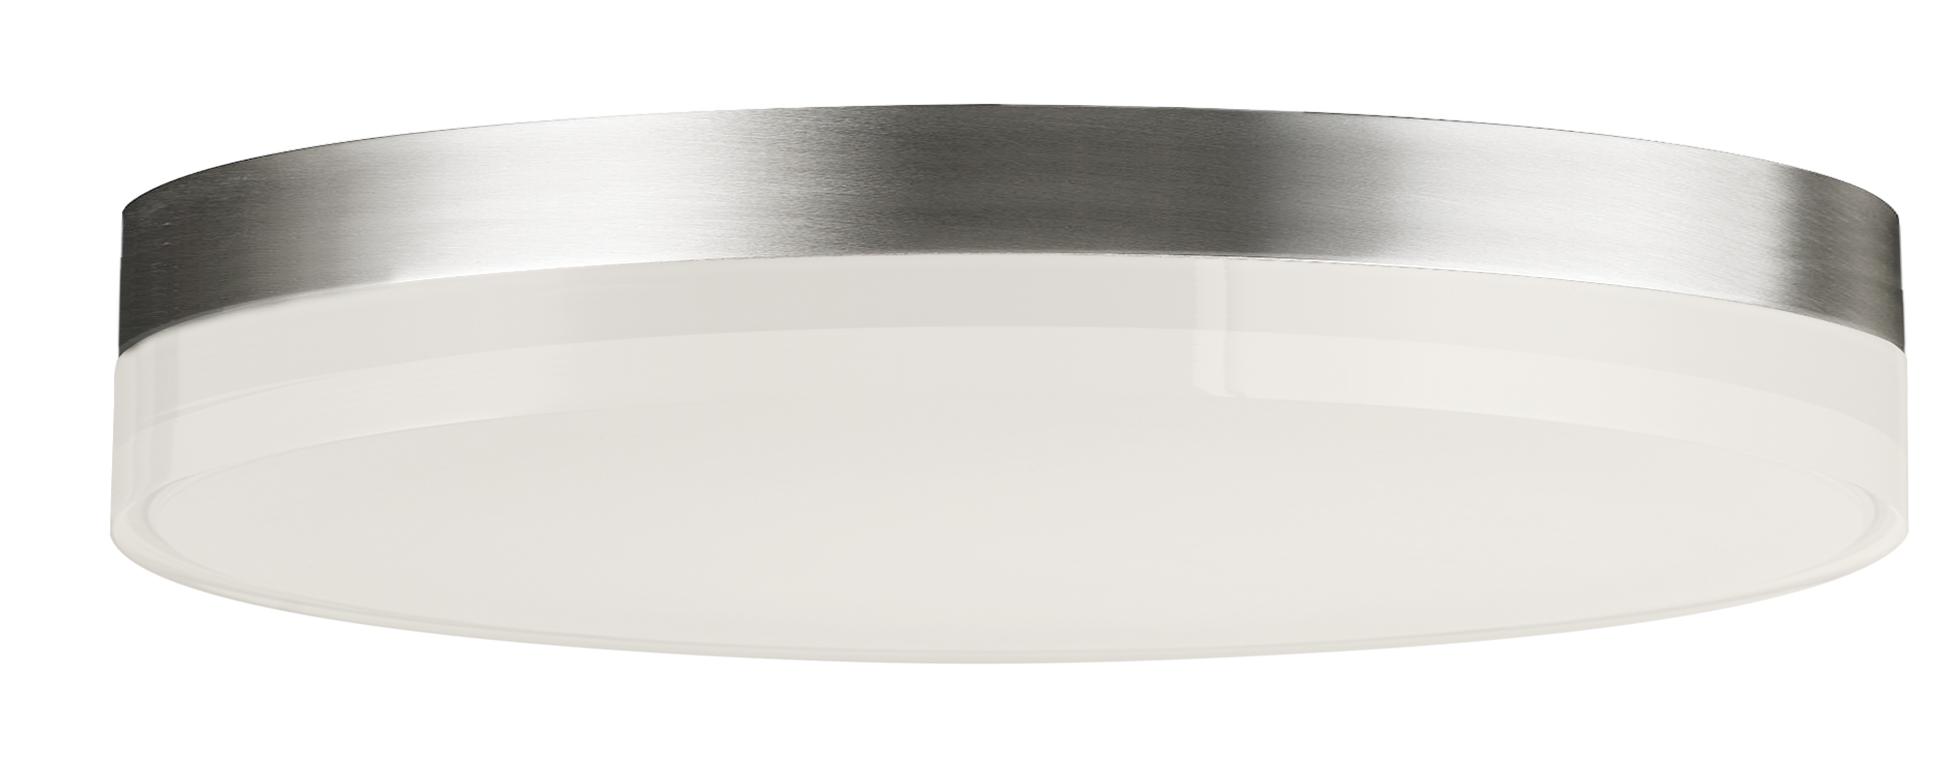 Illuminaire II 11-inch Round LED Flush Mount 3000K | Maxim Lighting